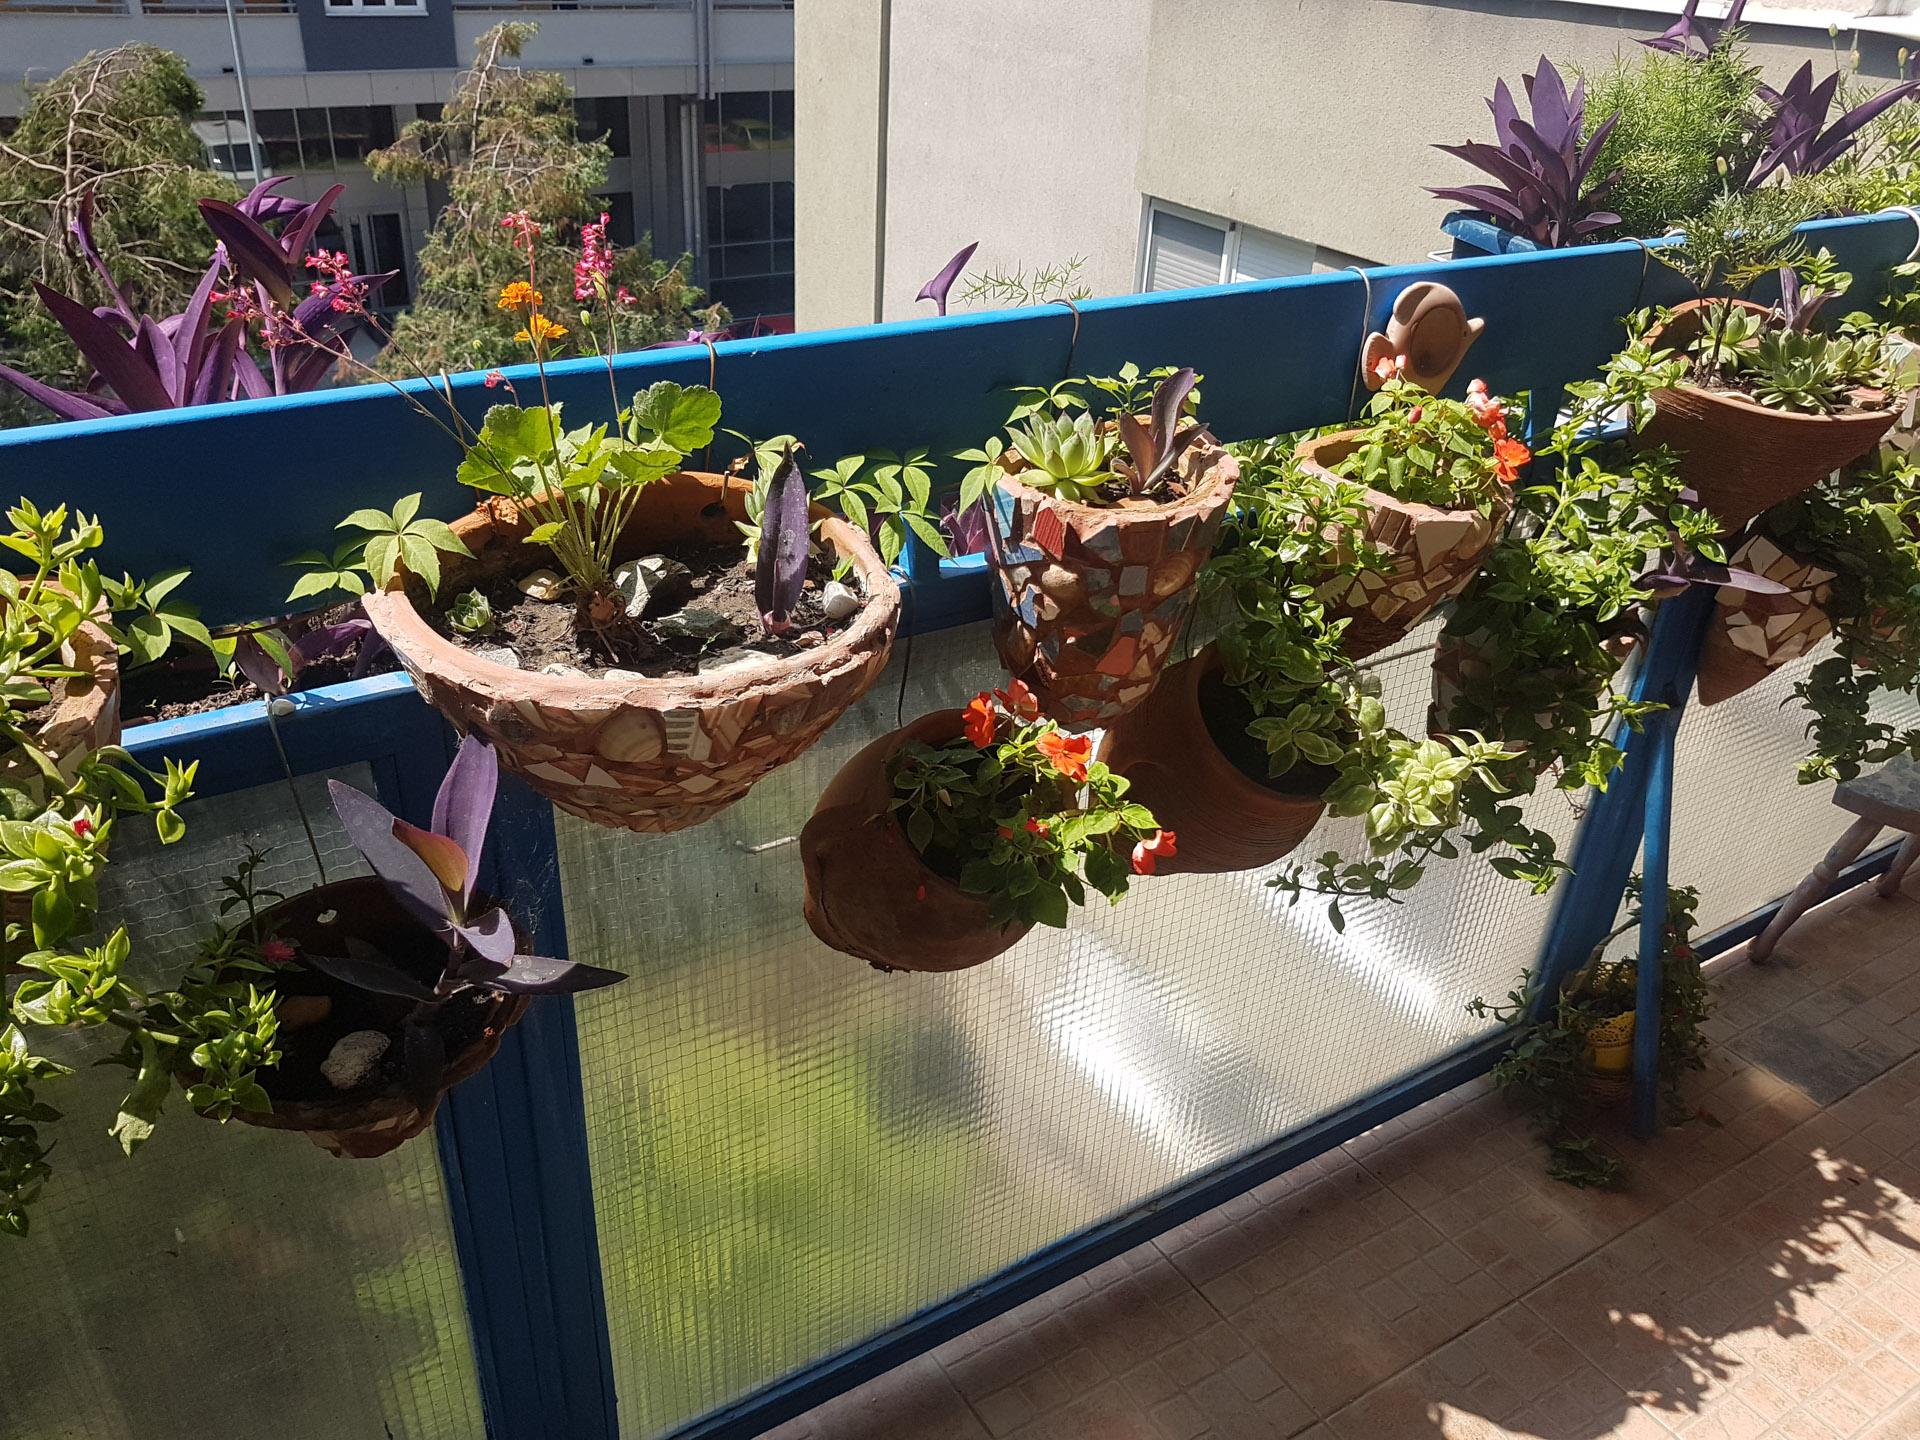 Najlepša bašta balkon 2019, Pančevo